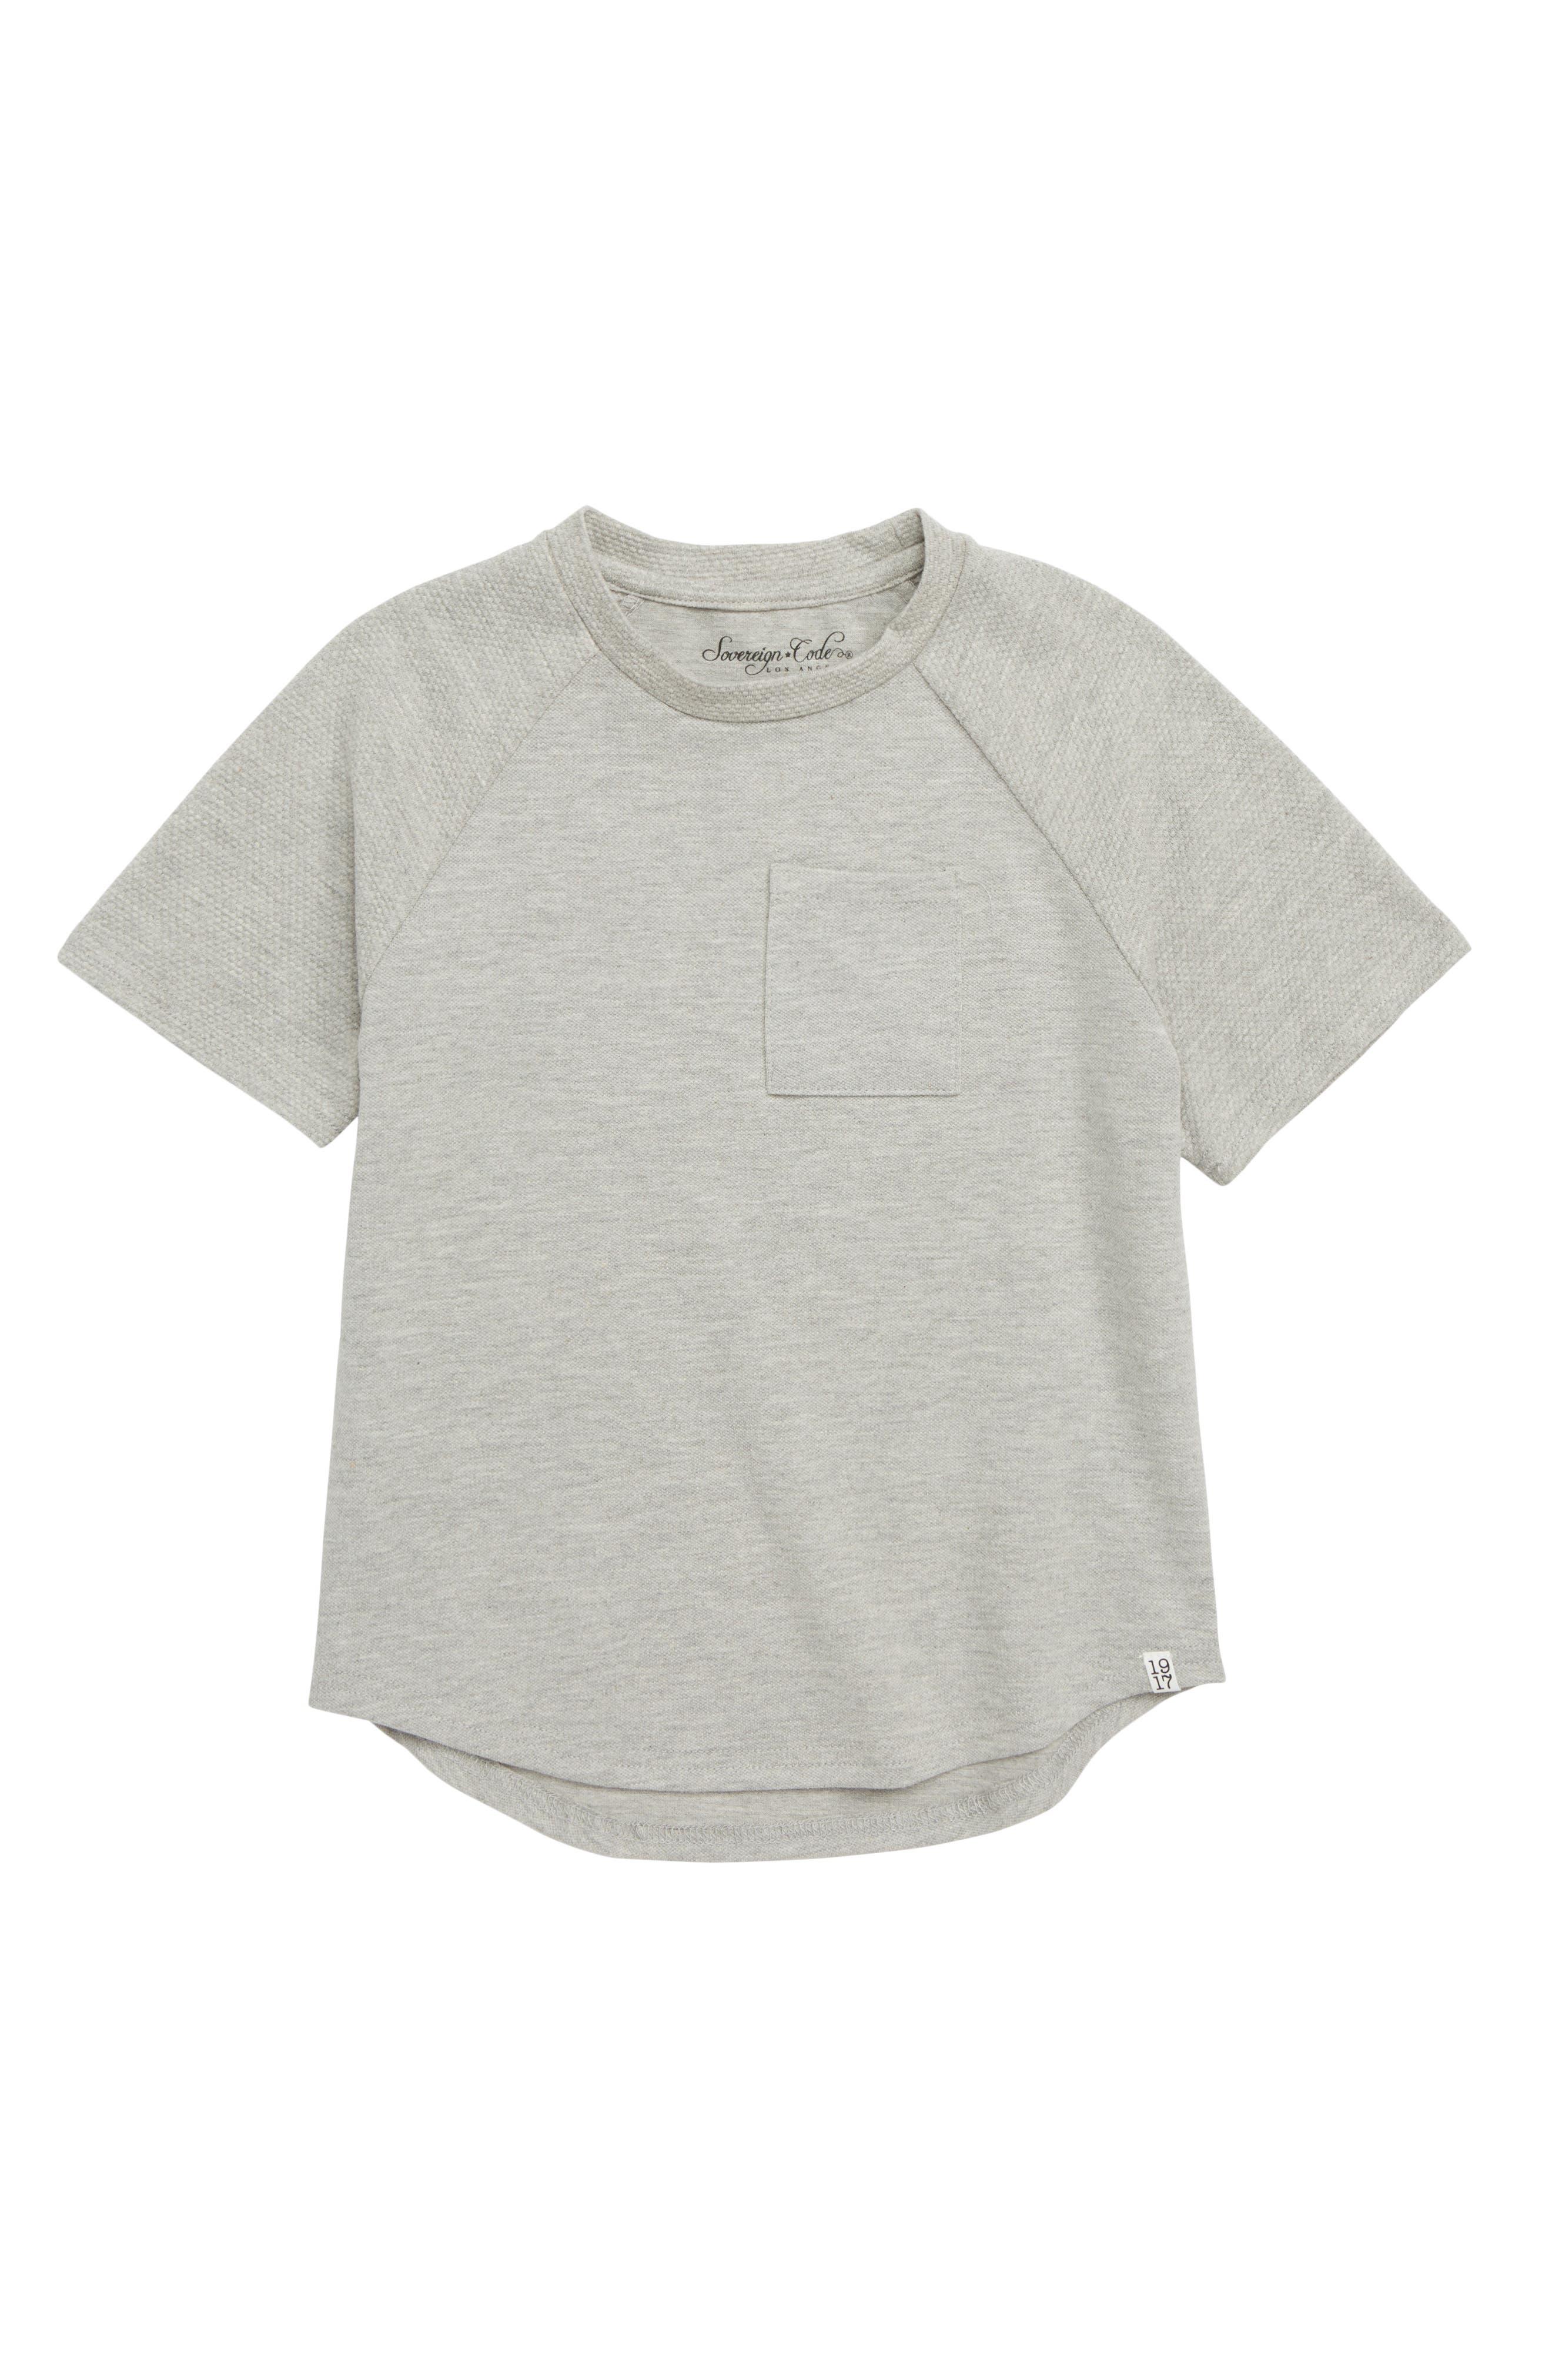 Suburb T-Shirt,                             Main thumbnail 1, color,                             HEATHER GREY